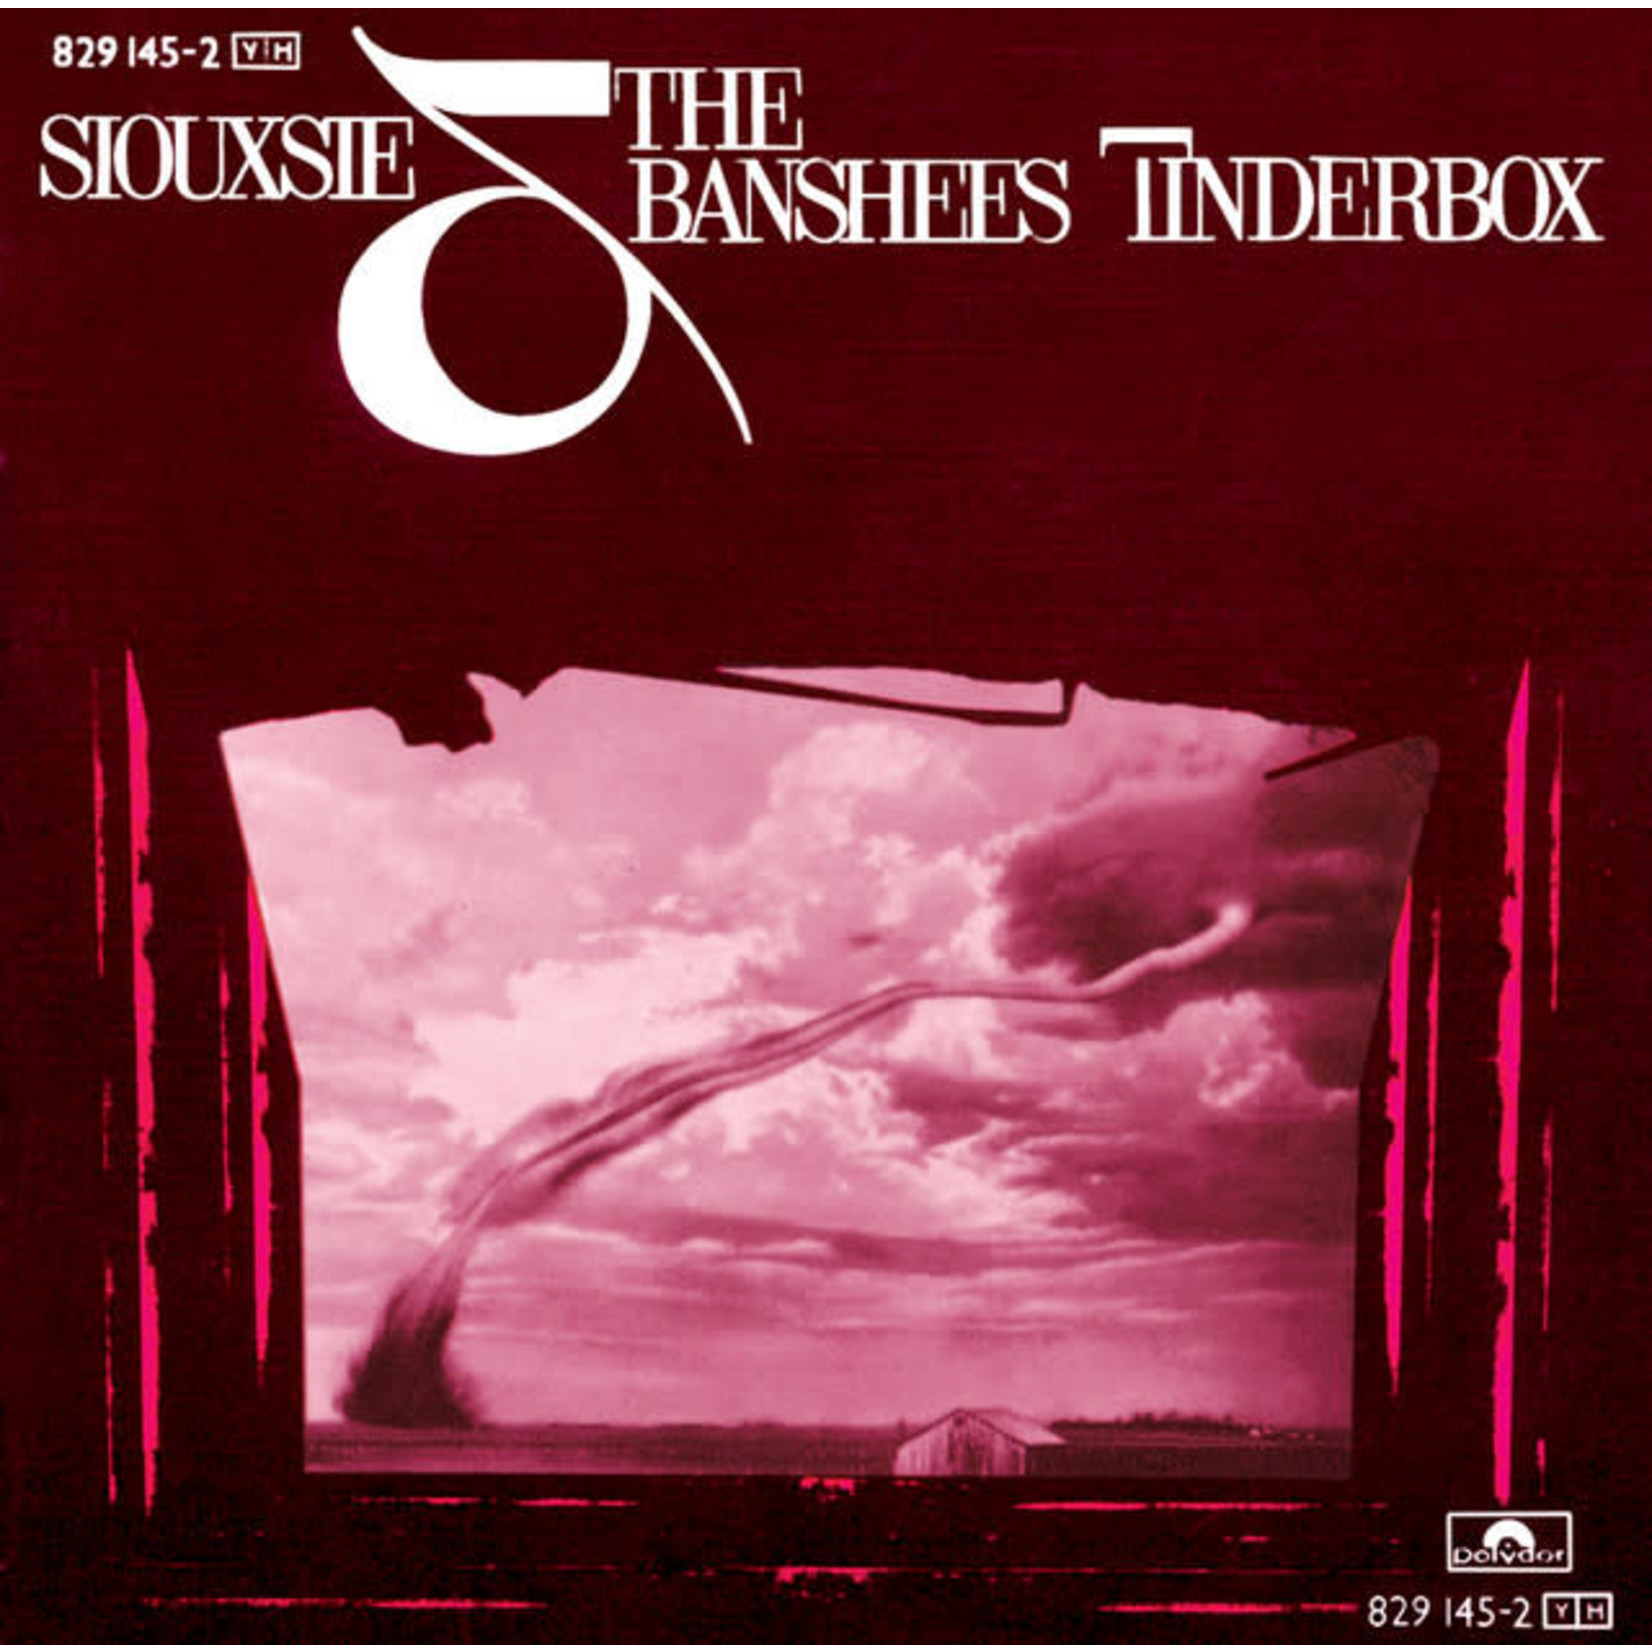 Vinyl Siouxsie & The Banshees - Tinderbox